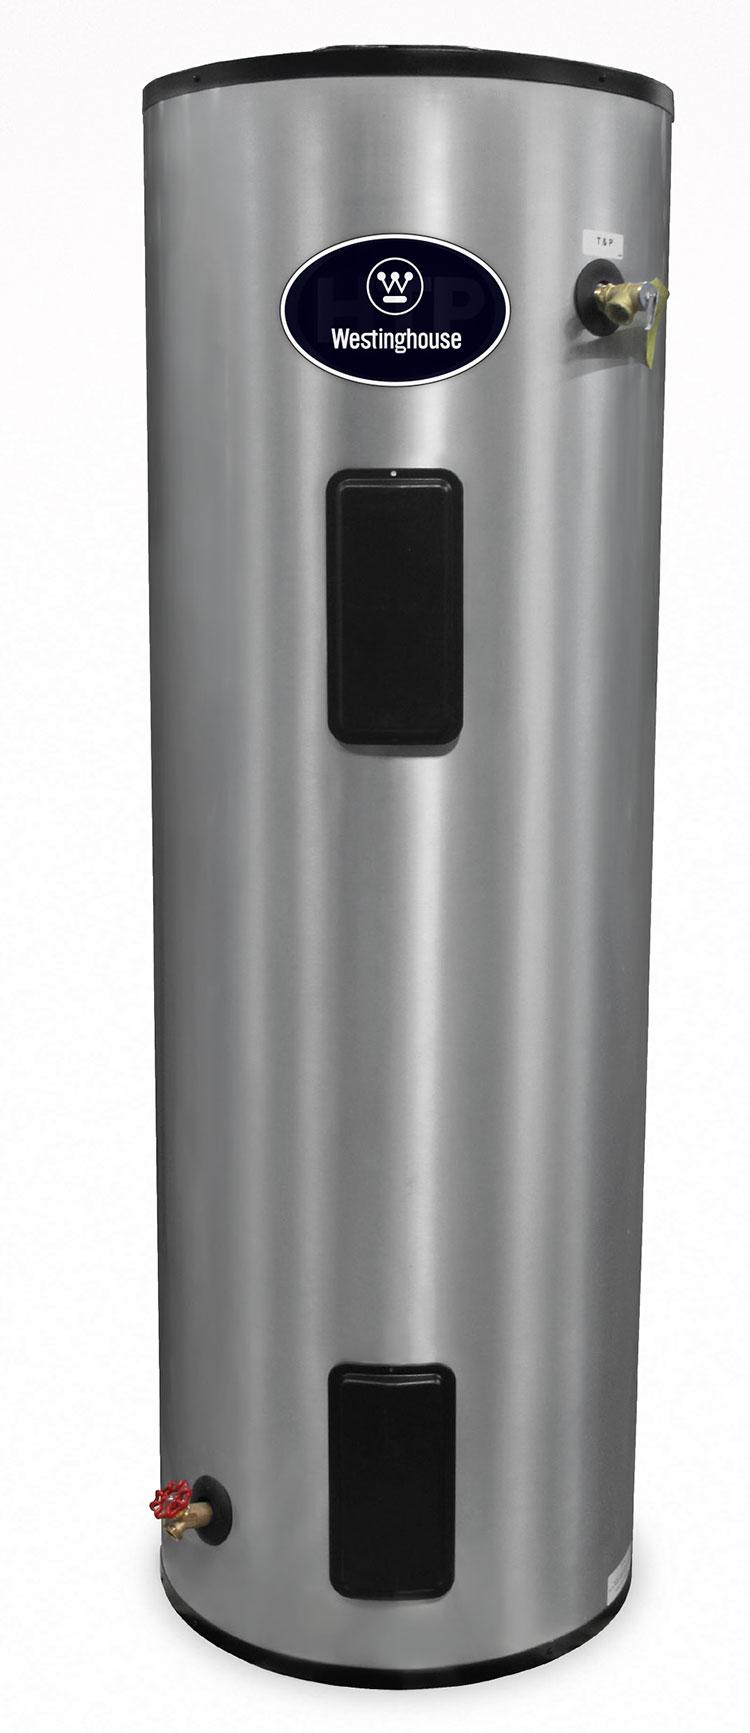 Electric water heater maintenance milwaukee m18 screwdriver